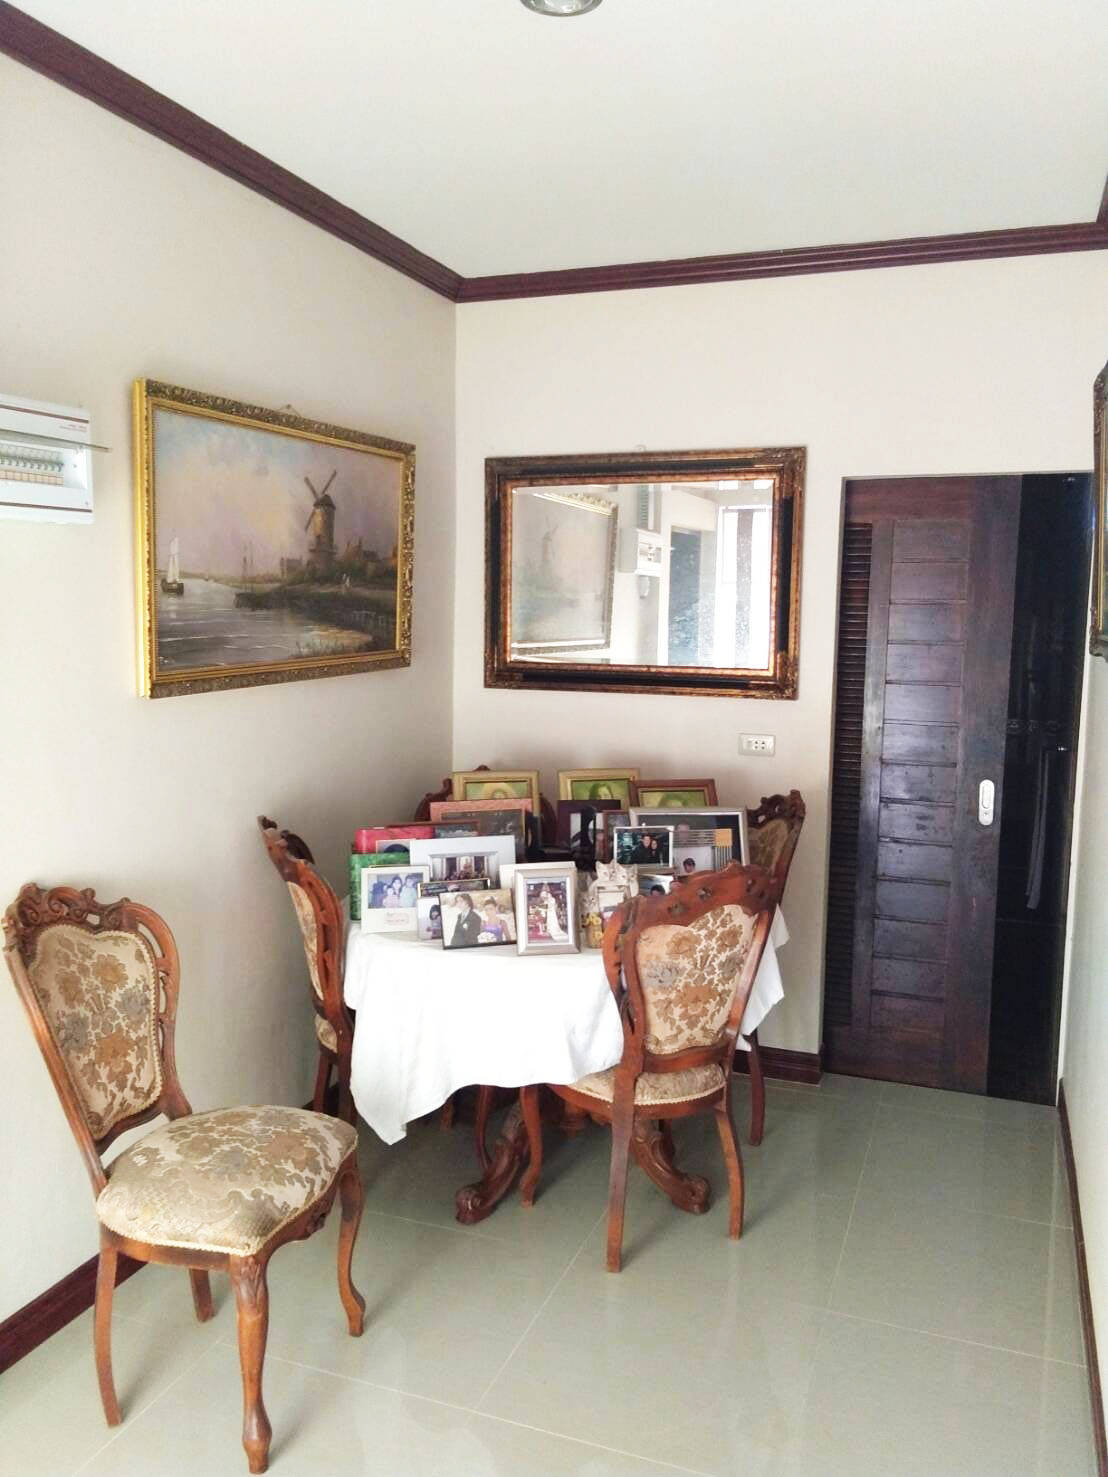 Coridor to Bedroom 1 & 2